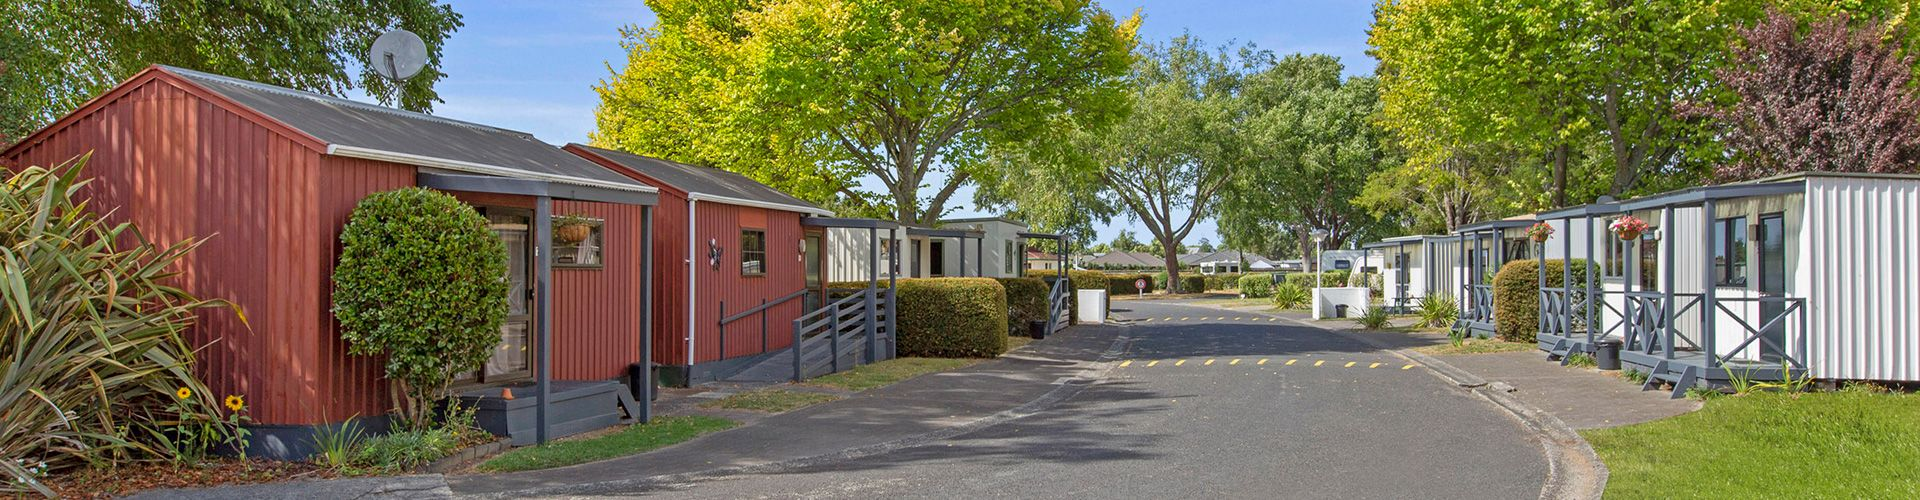 hamilton accommodation cabins